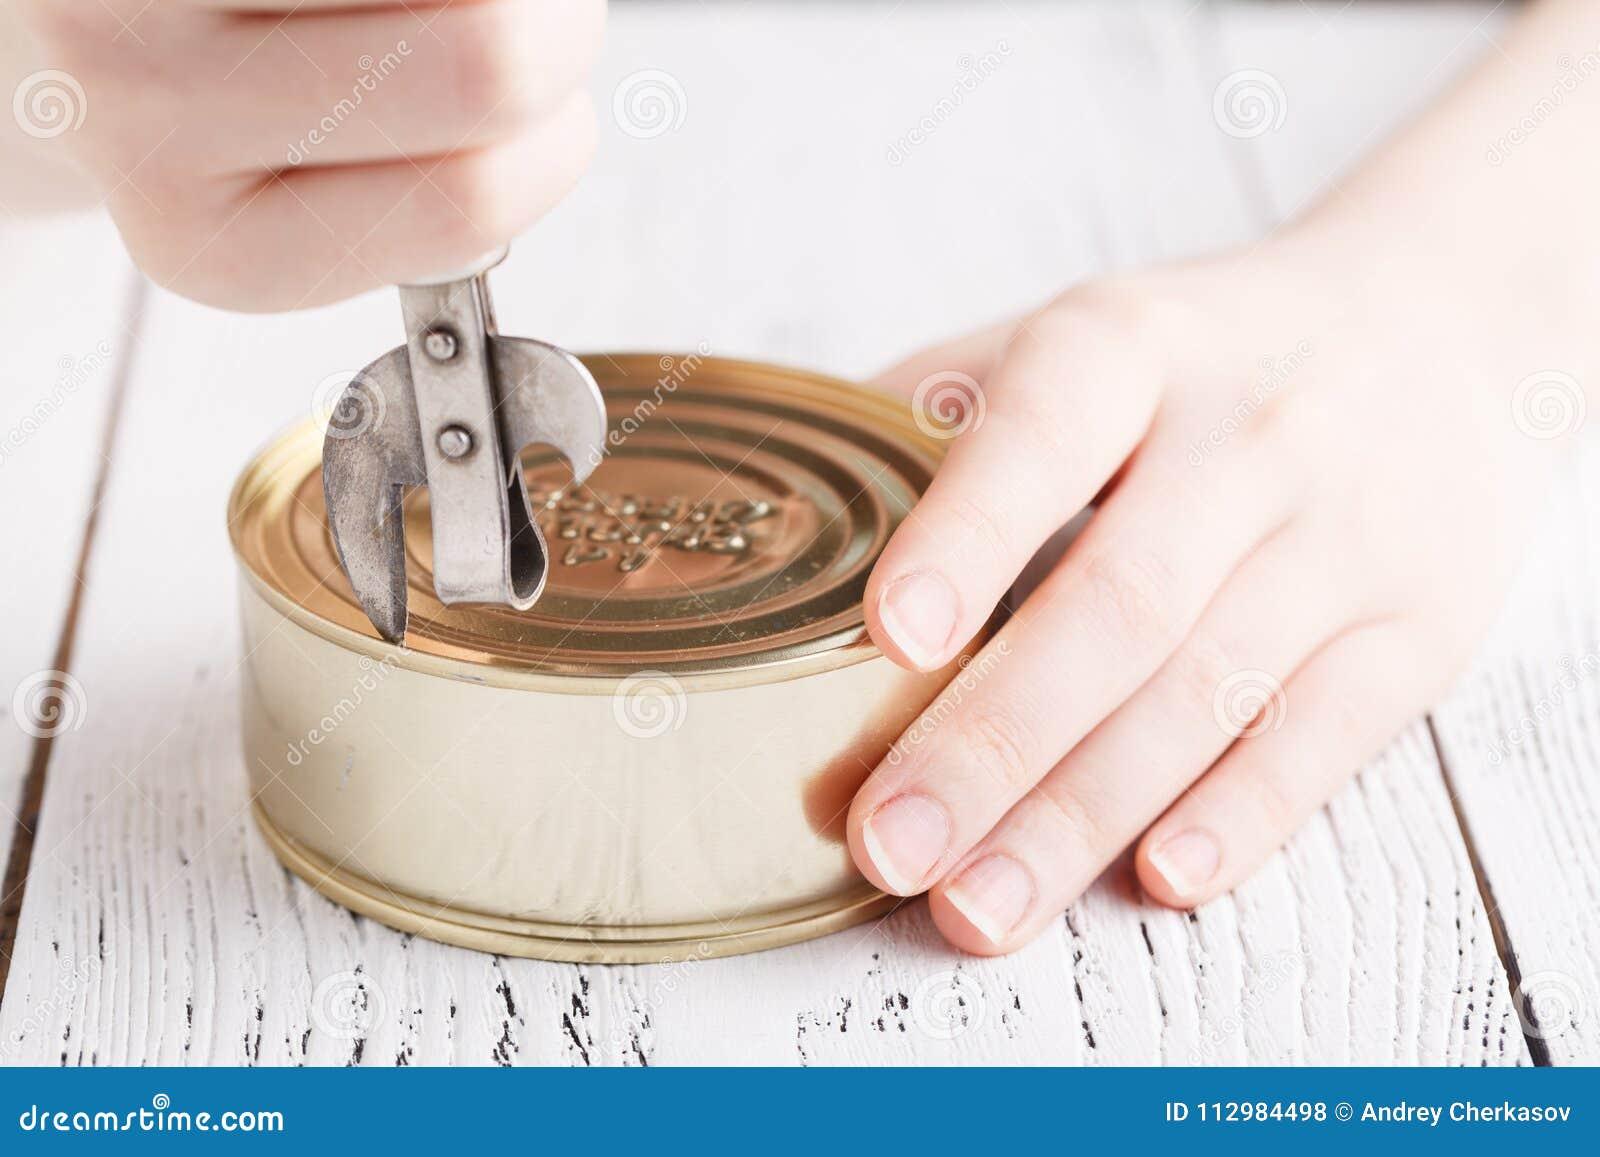 Open tinacan with knife, close up